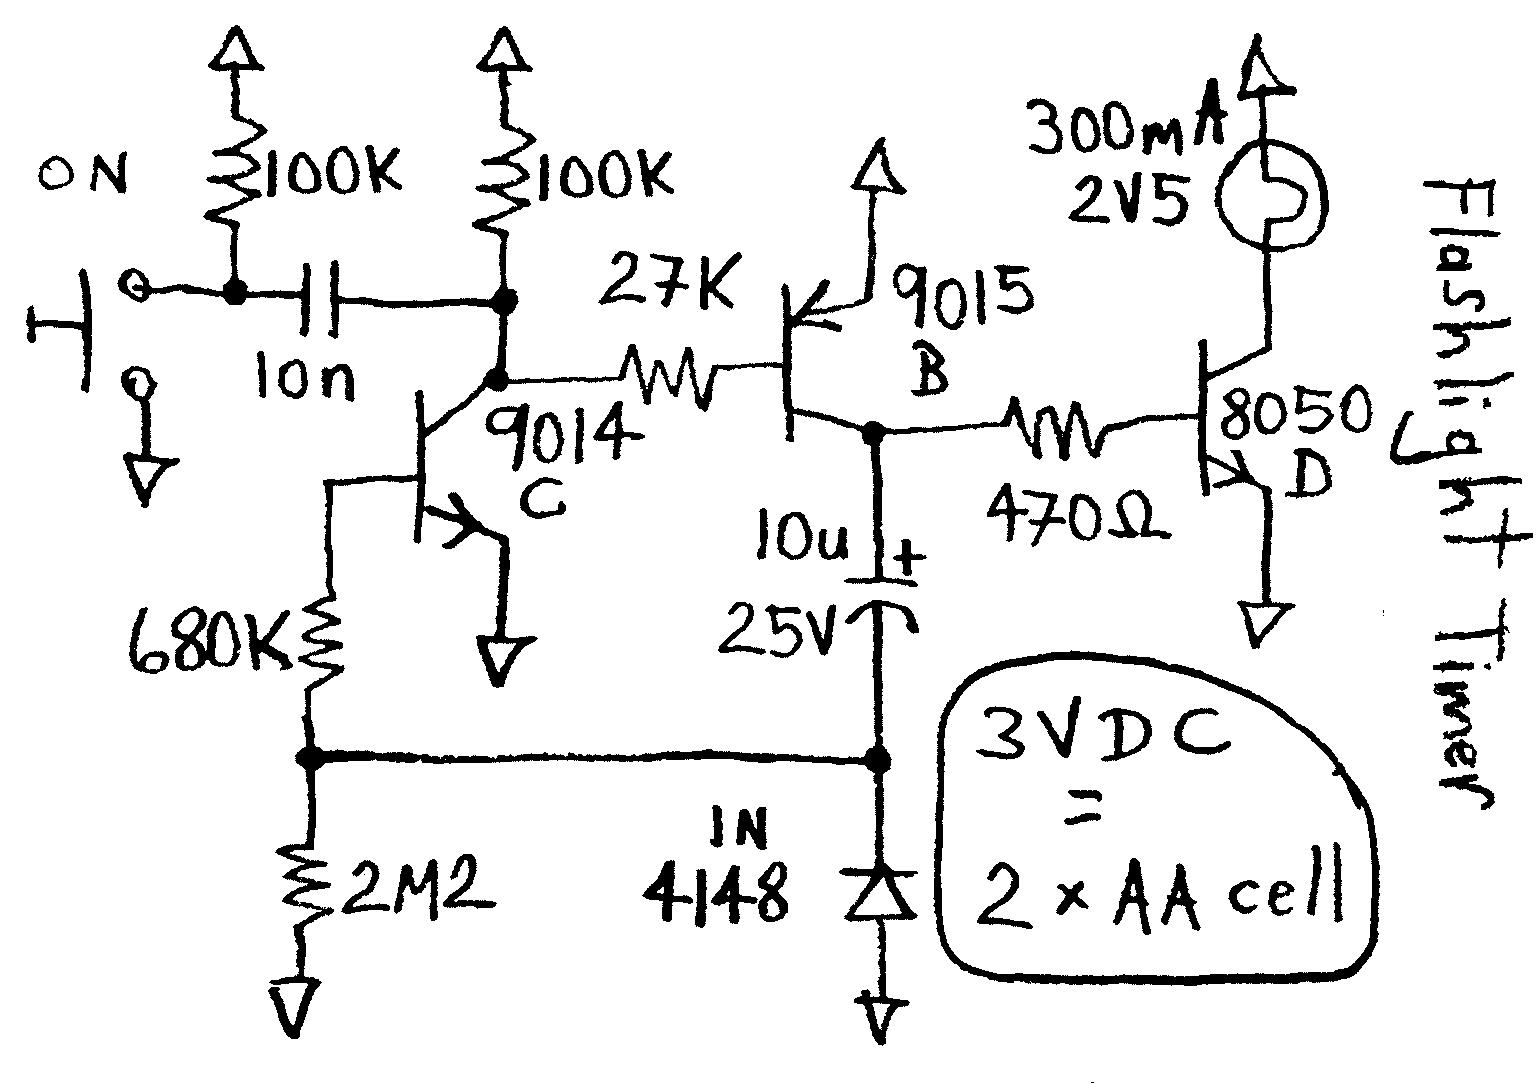 u0026gt  meter counter  u0026gt  delay circuits  u0026gt  delay circuit for a